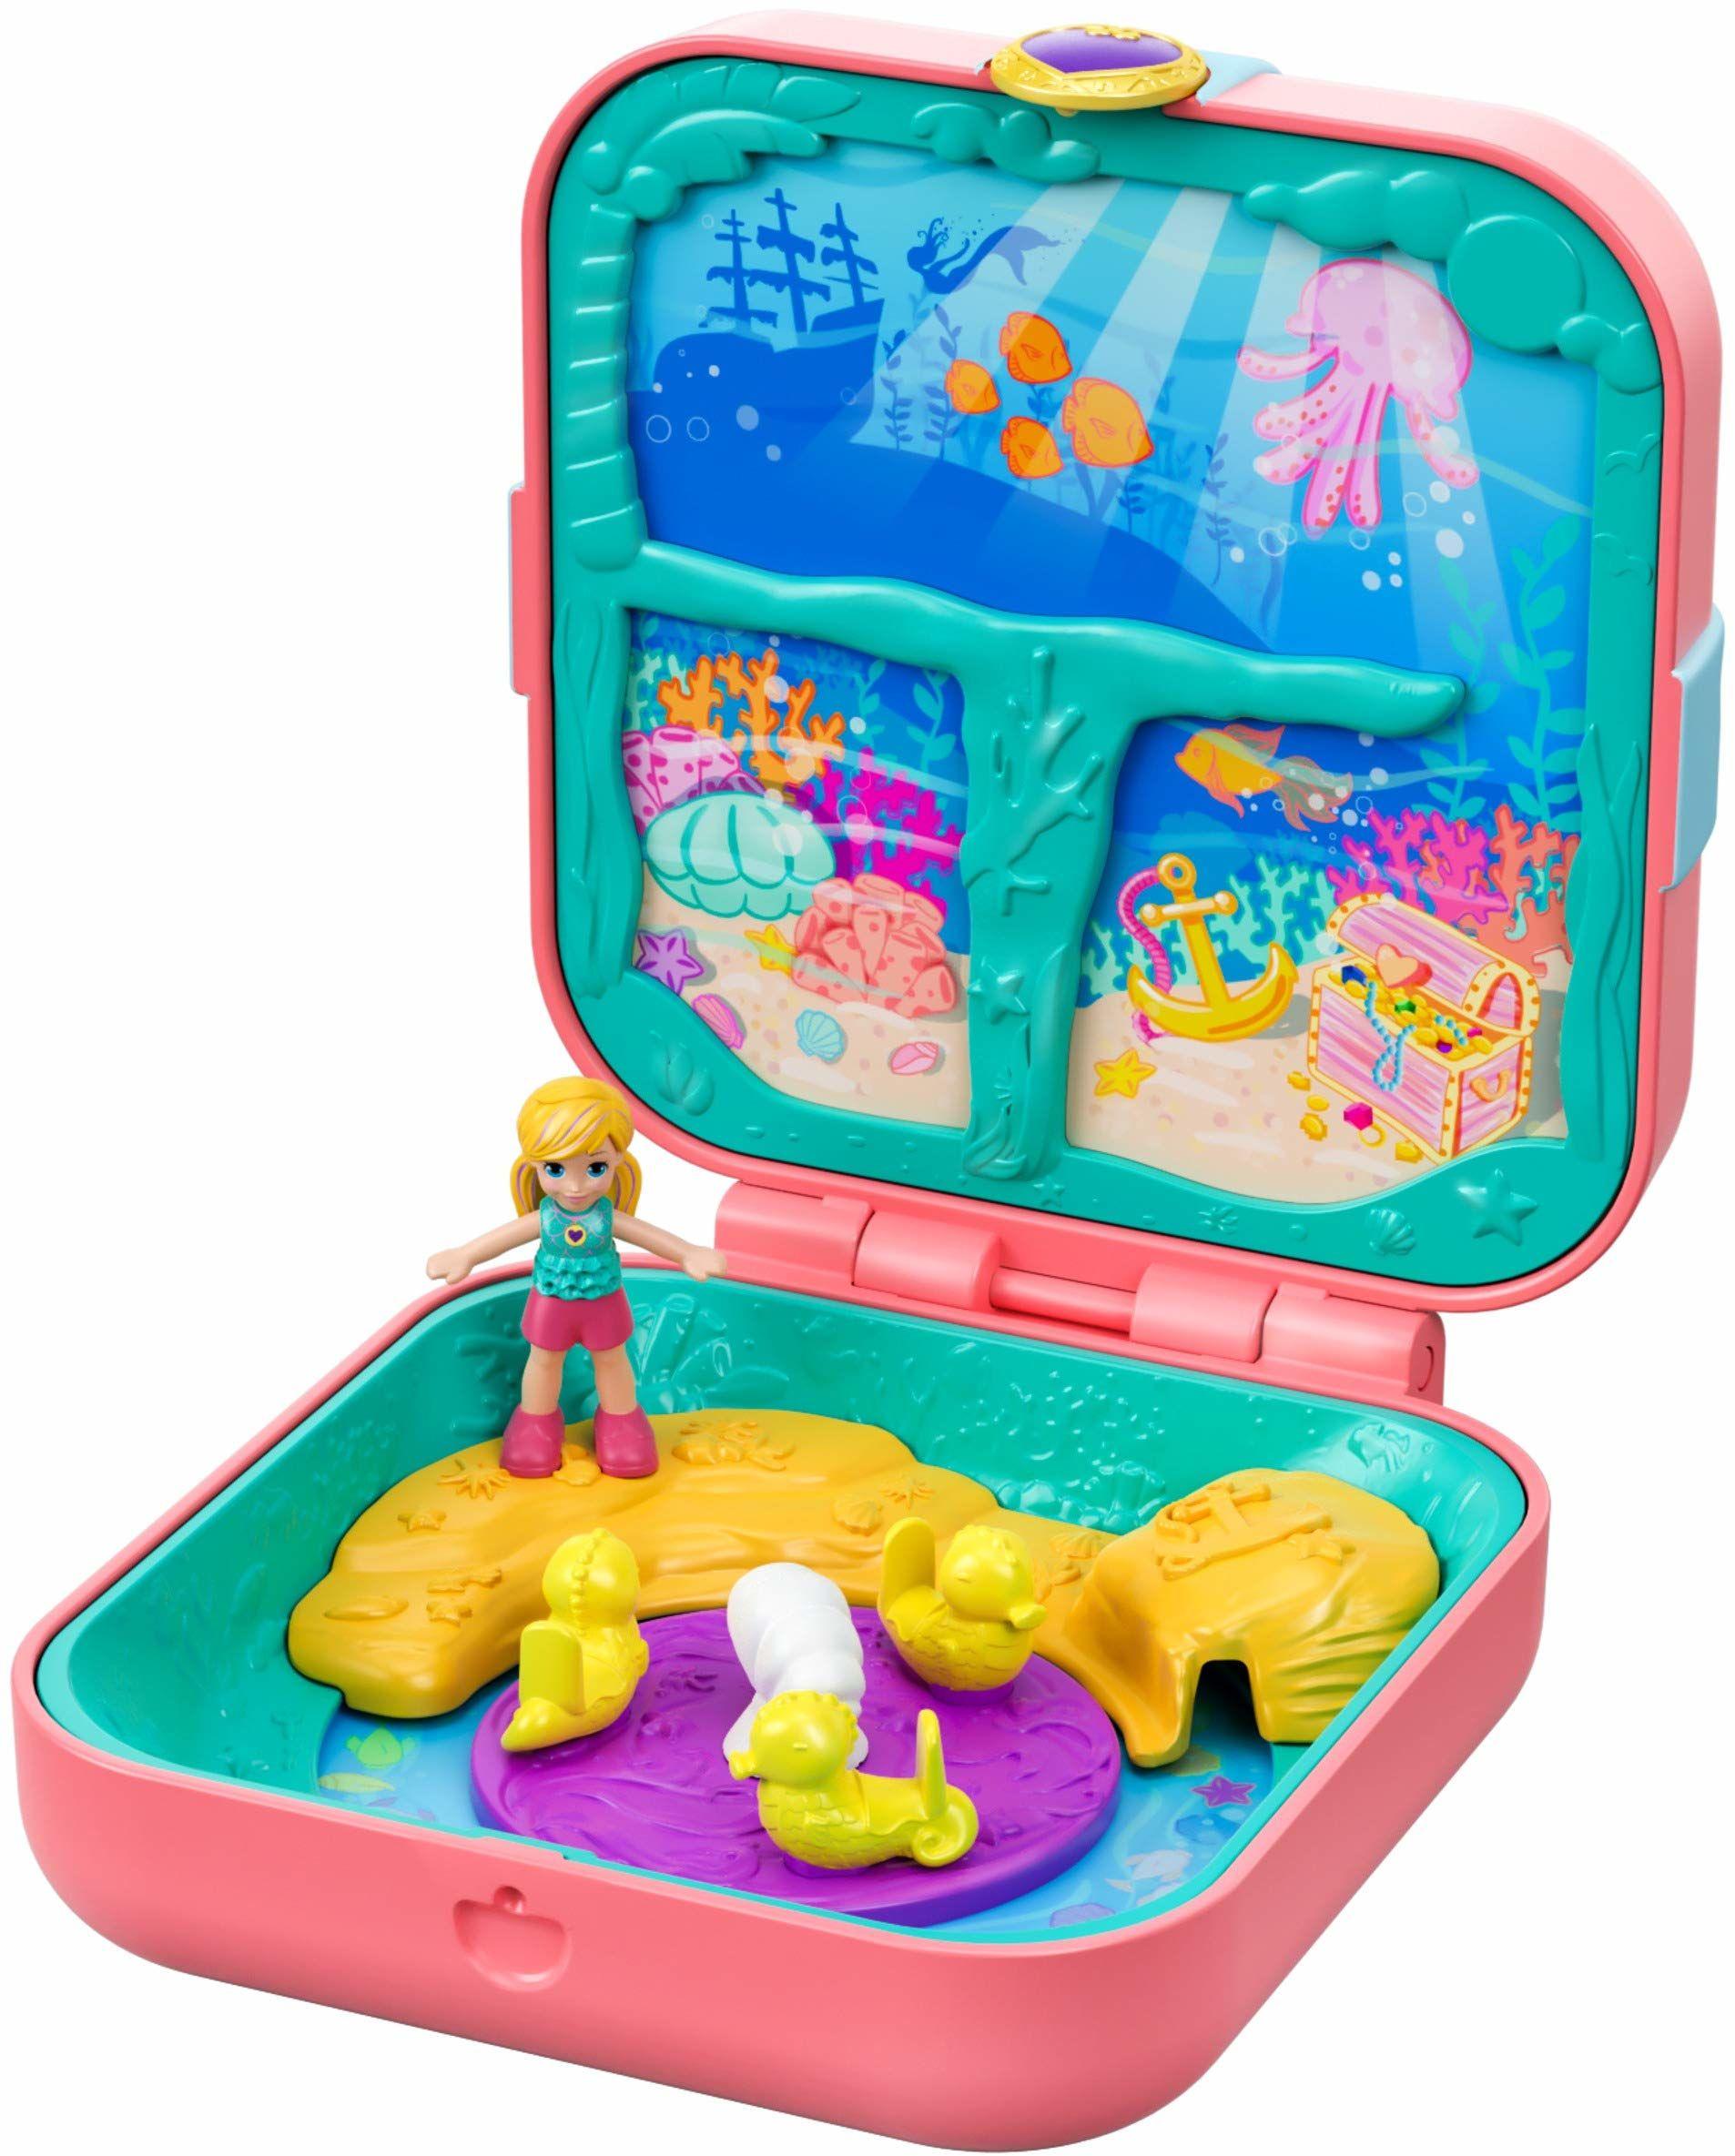 Polly Pocket GDK77  ukryte skarby ogon syrenki, lalka zabawka dla dzieci od 4 roku życia